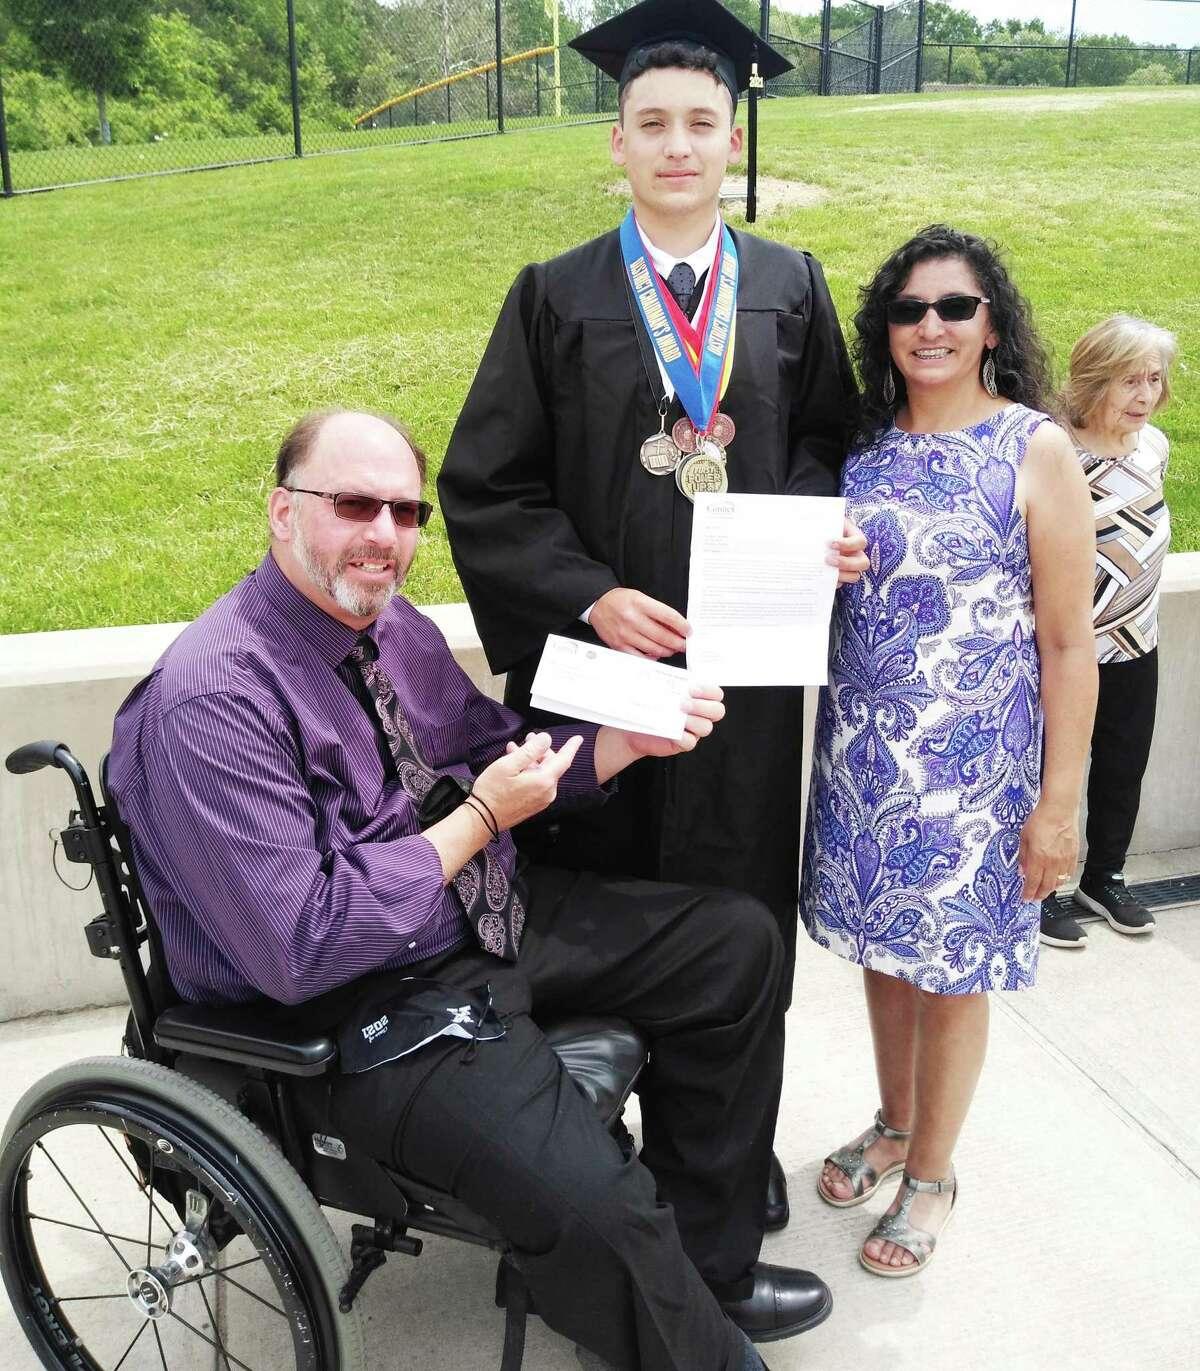 Jonathan Gonzalez of Meriden has received the 2021 Liberty Bank Donald B. Wilbur Scholarship. He is pictured with his parents, Hiram, left, and Angela Gonzalez.